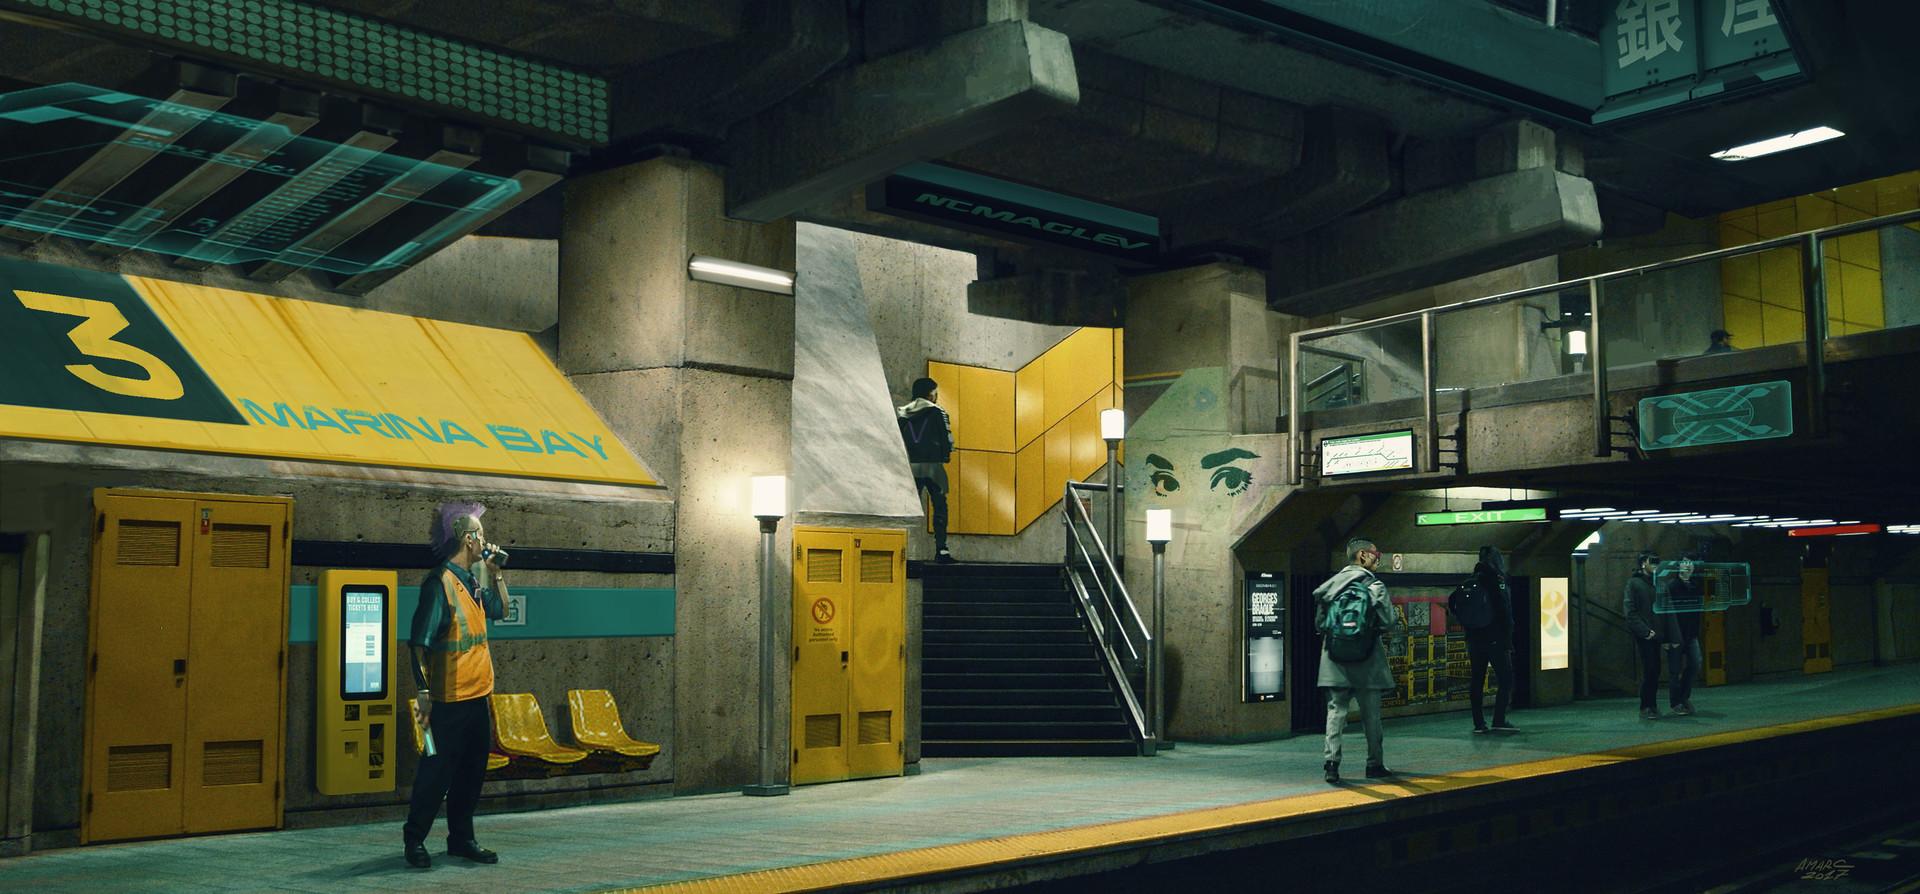 adrian-marc-amarc-marina-metro-station.j